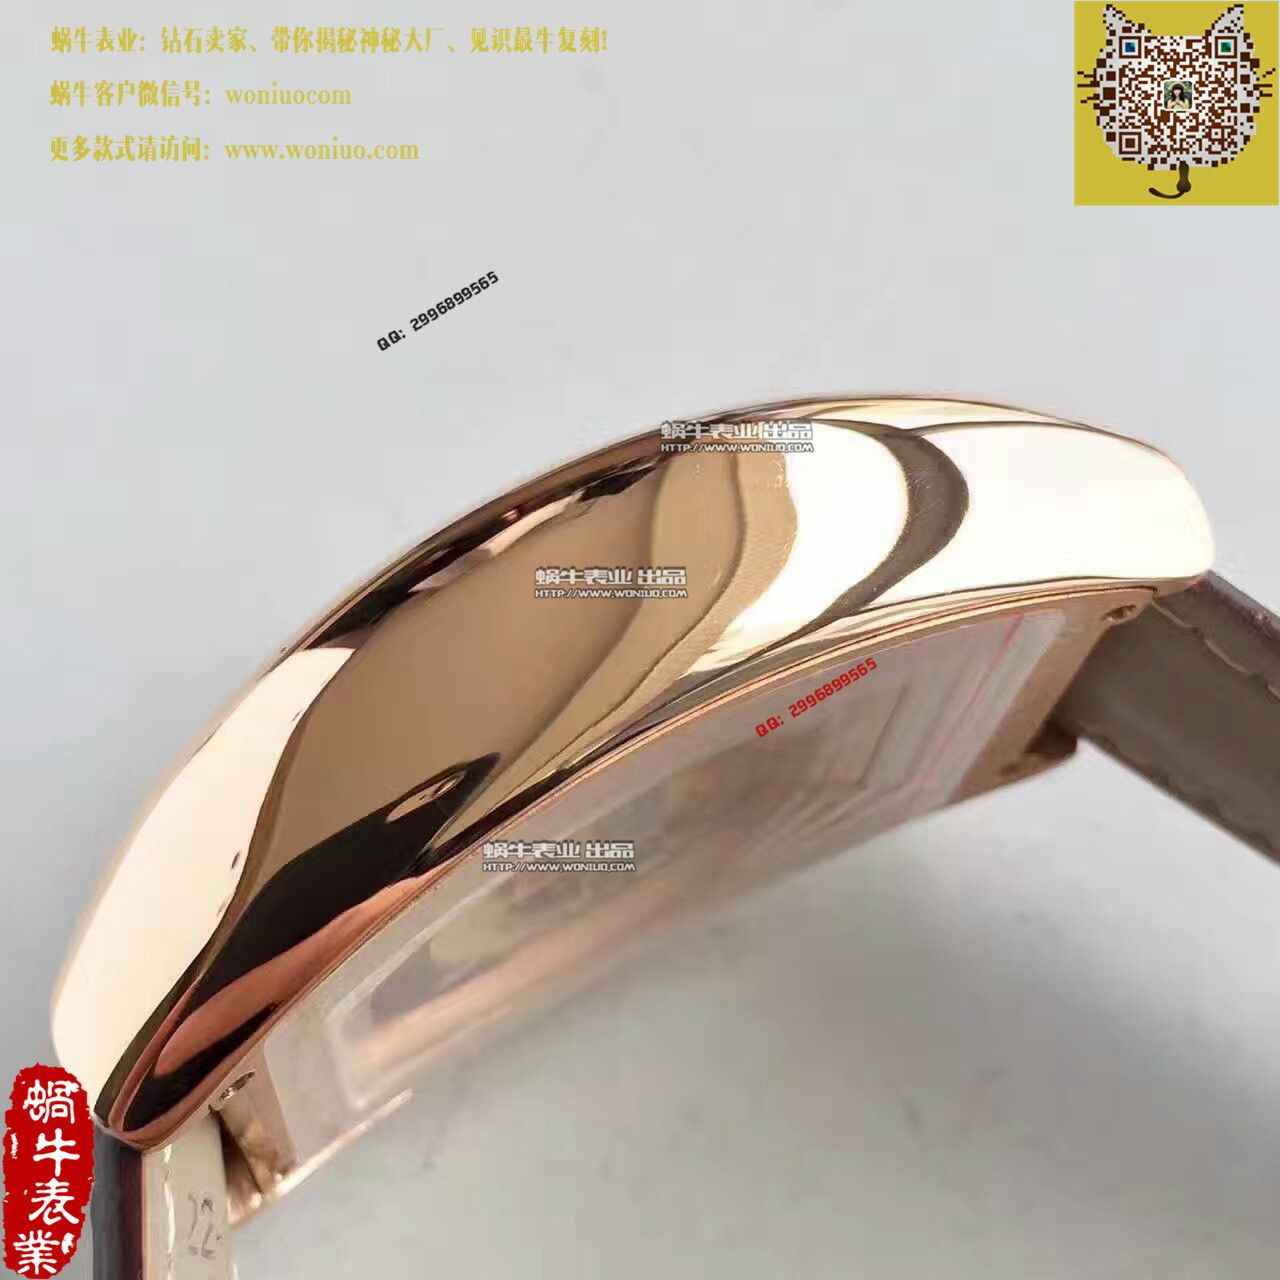 【FM厂一比一高仿手表】法穆兰MEN'S COLLECTION系列8880 B S6 SQT腕表